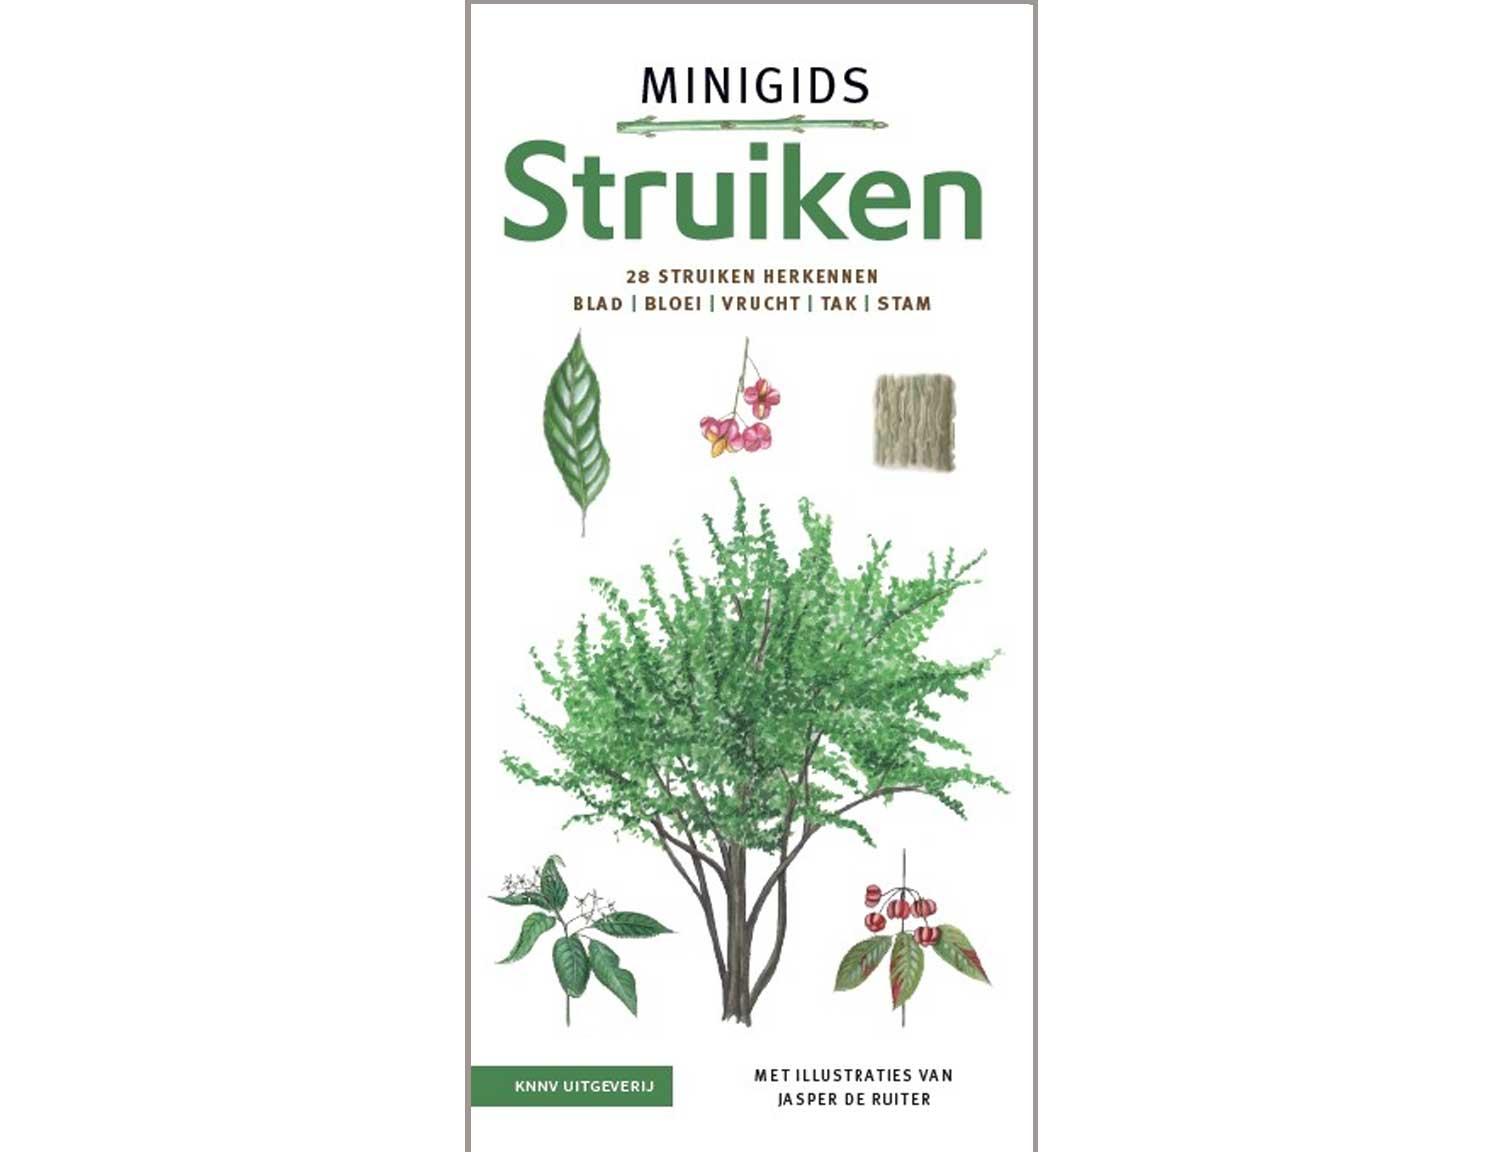 minigids_struiken